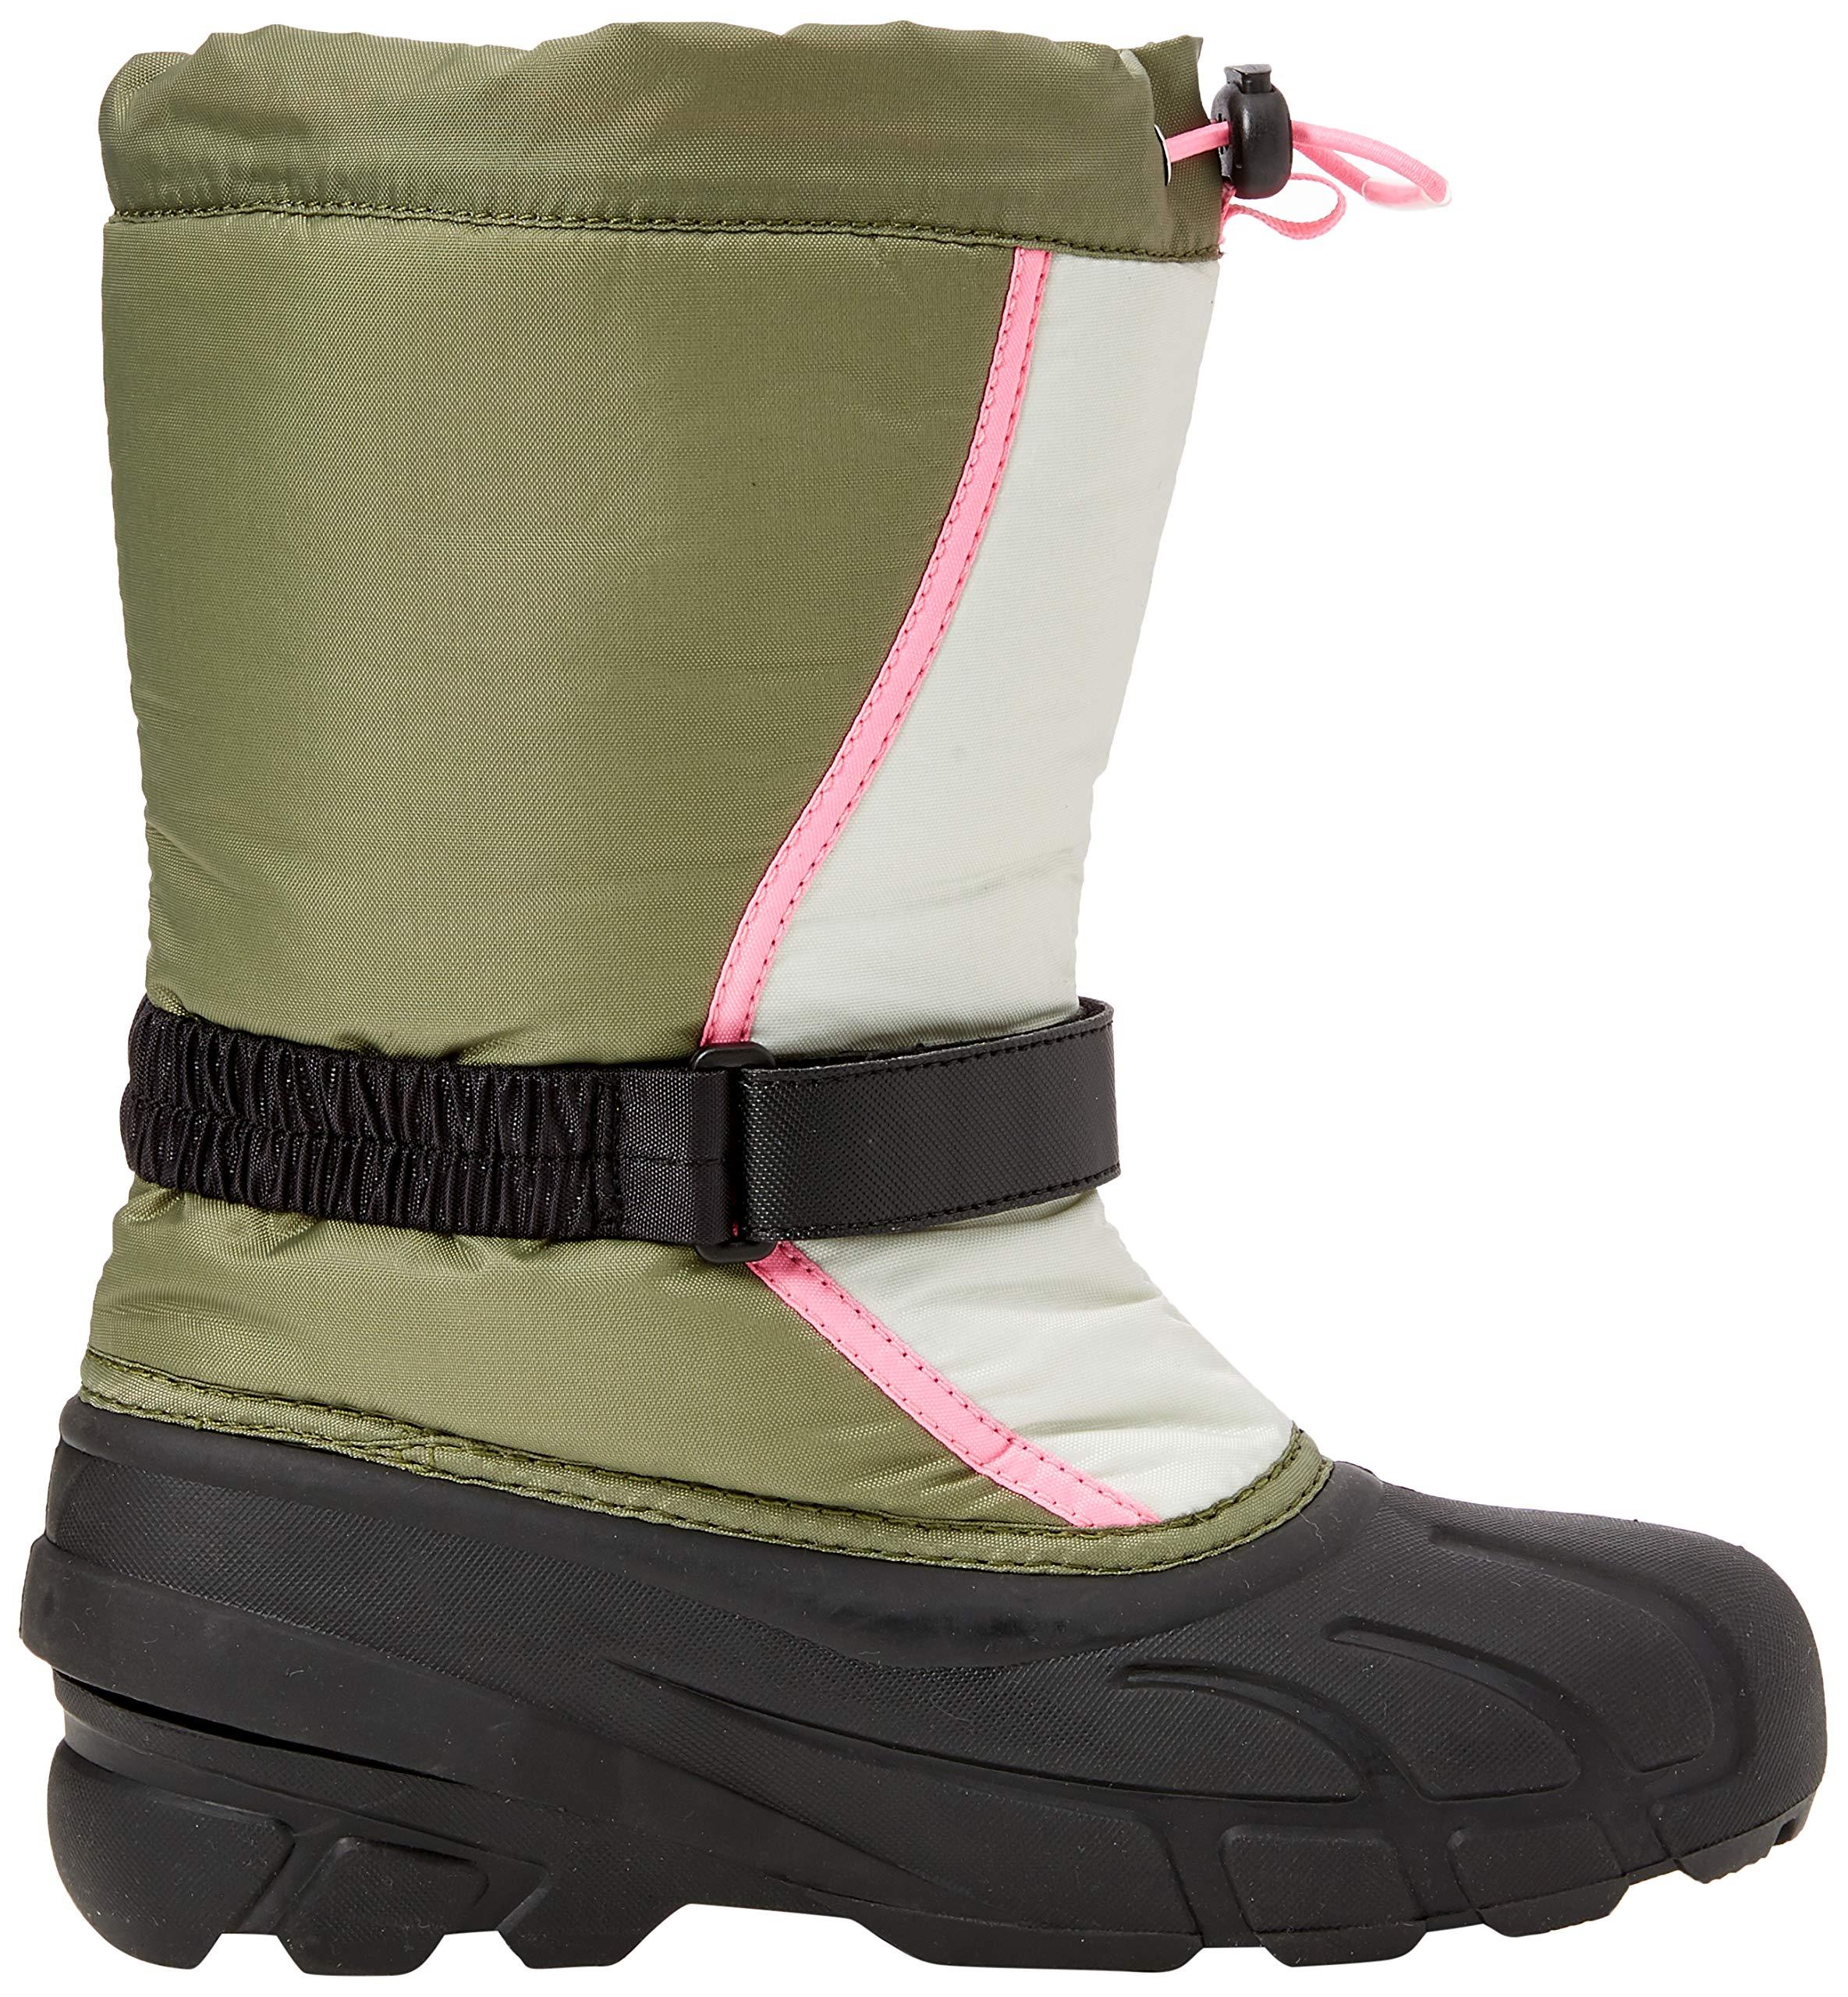 Sorel Girls' Youth Flurry Snow Boot, Hiker Green, Bubblegum, 5 M US Big Kid by Sorel (Image #6)